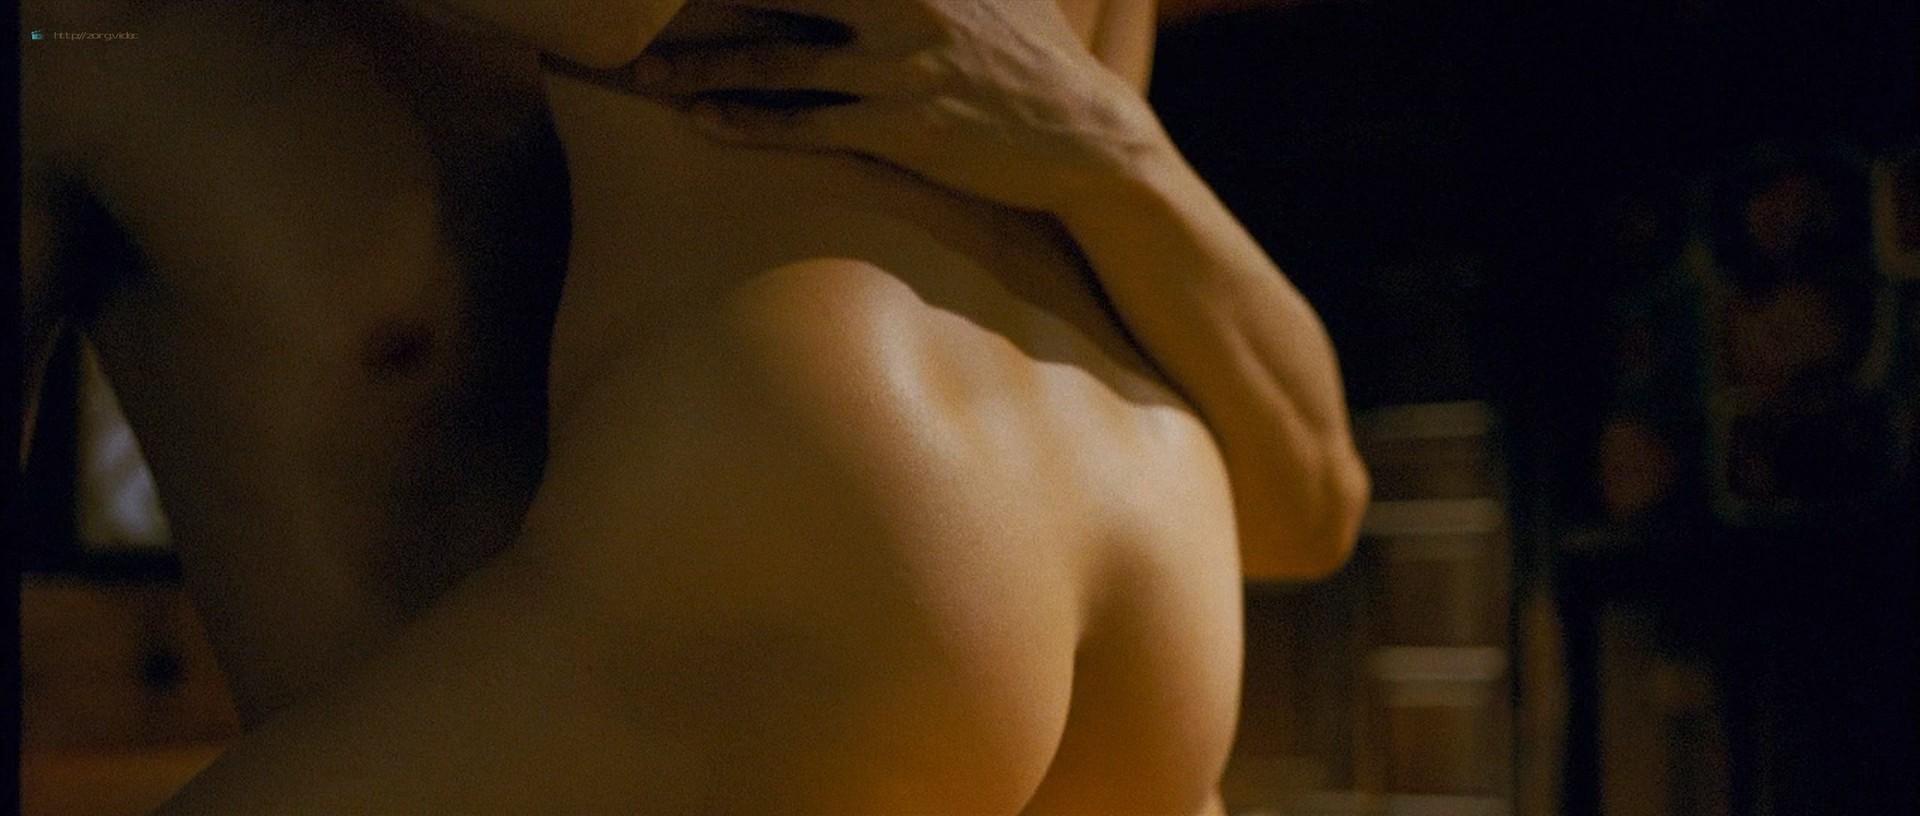 Cho Yeo-jeong nude sex Ryu Hyun-kyung nude too- The Servant (KR-2010) HD 1080p BluRay (10)